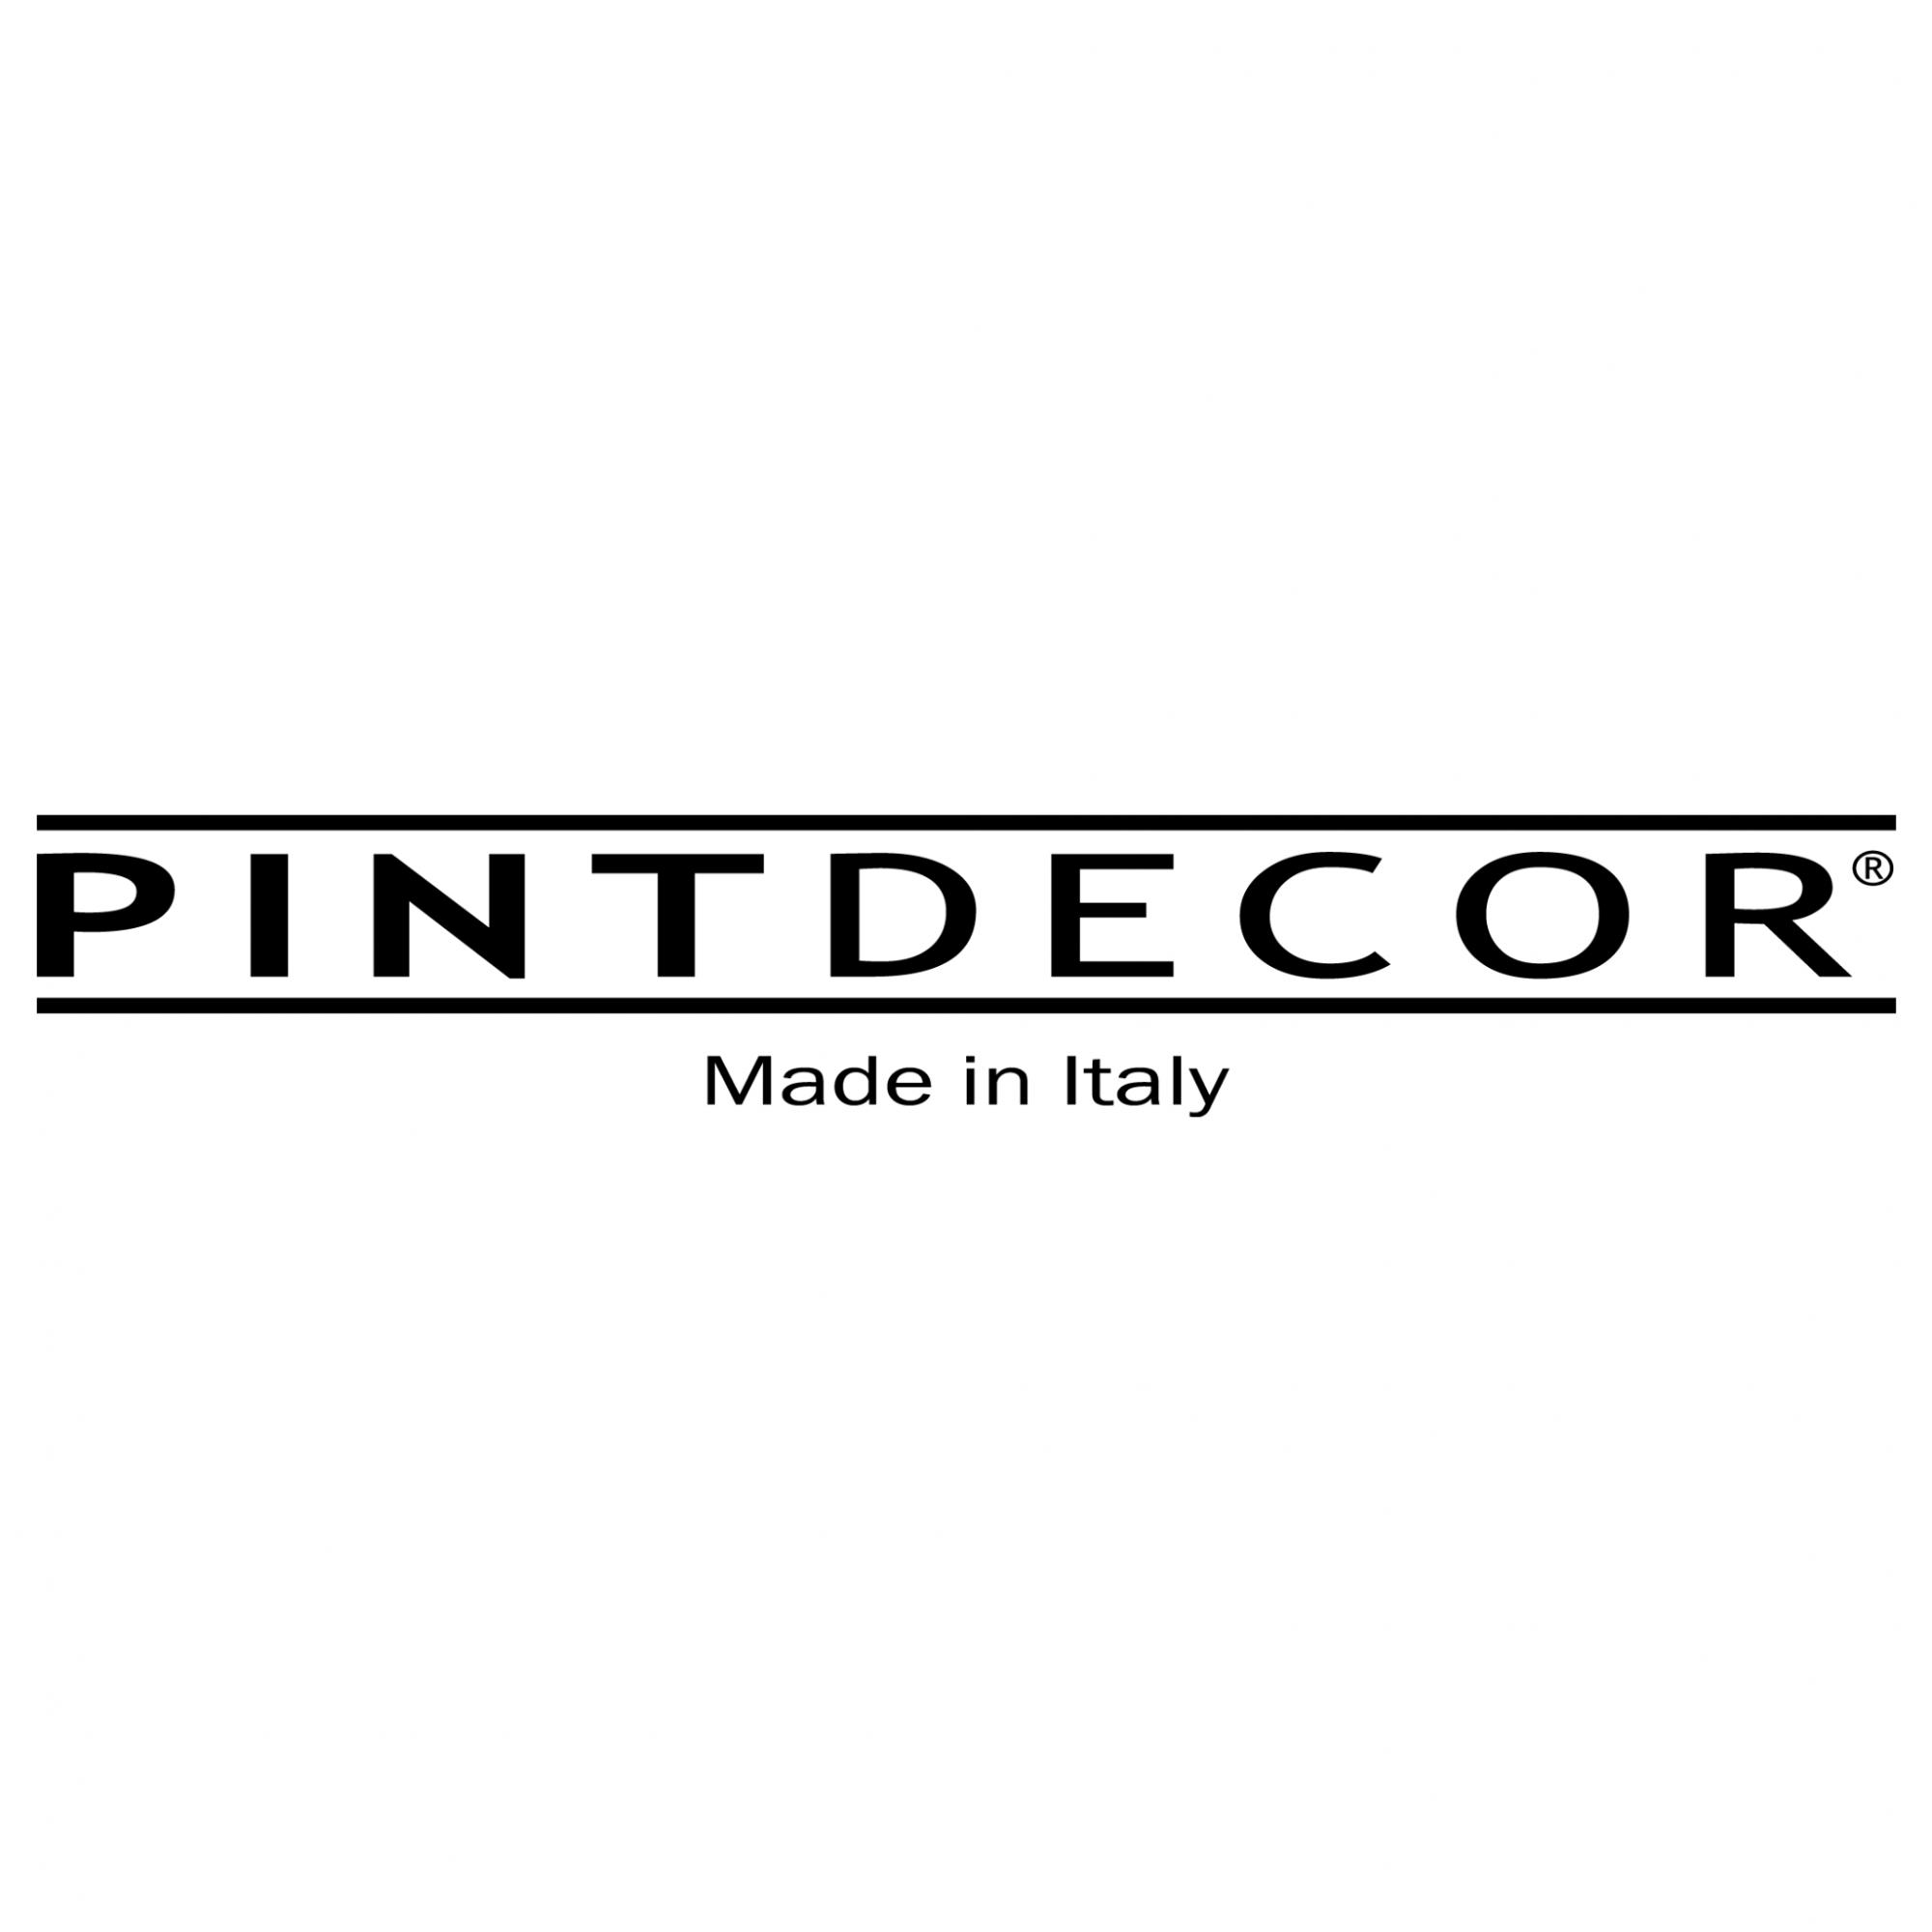 Pintdecor graphicollection